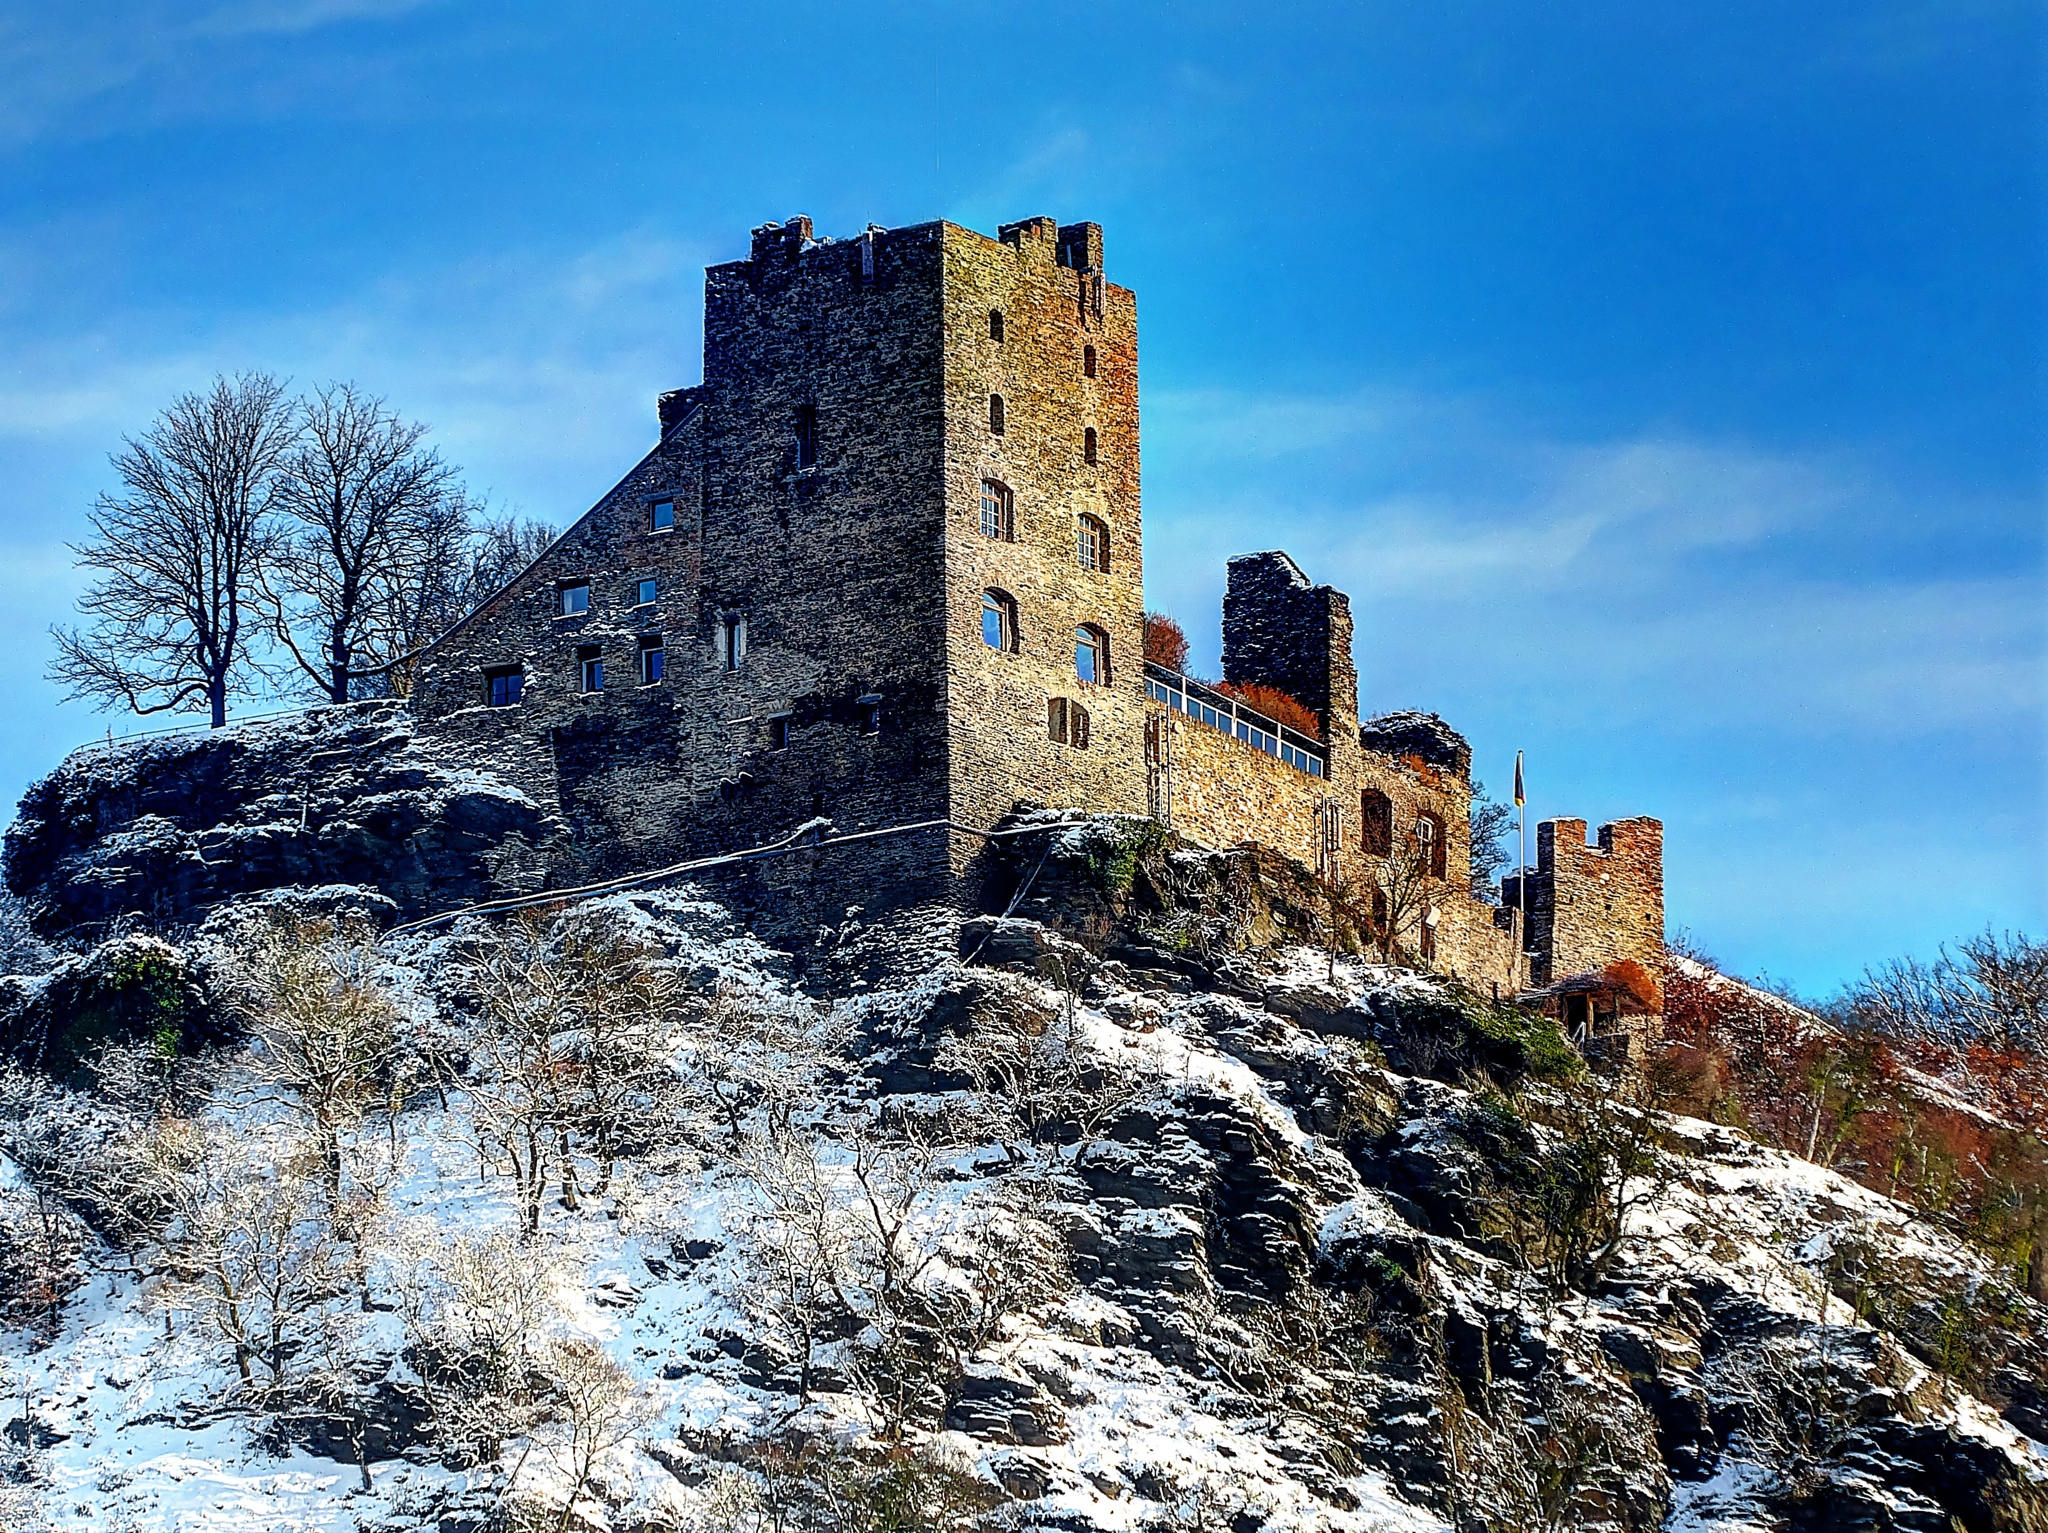 Liebenstein Castle, Germany by Thinduck